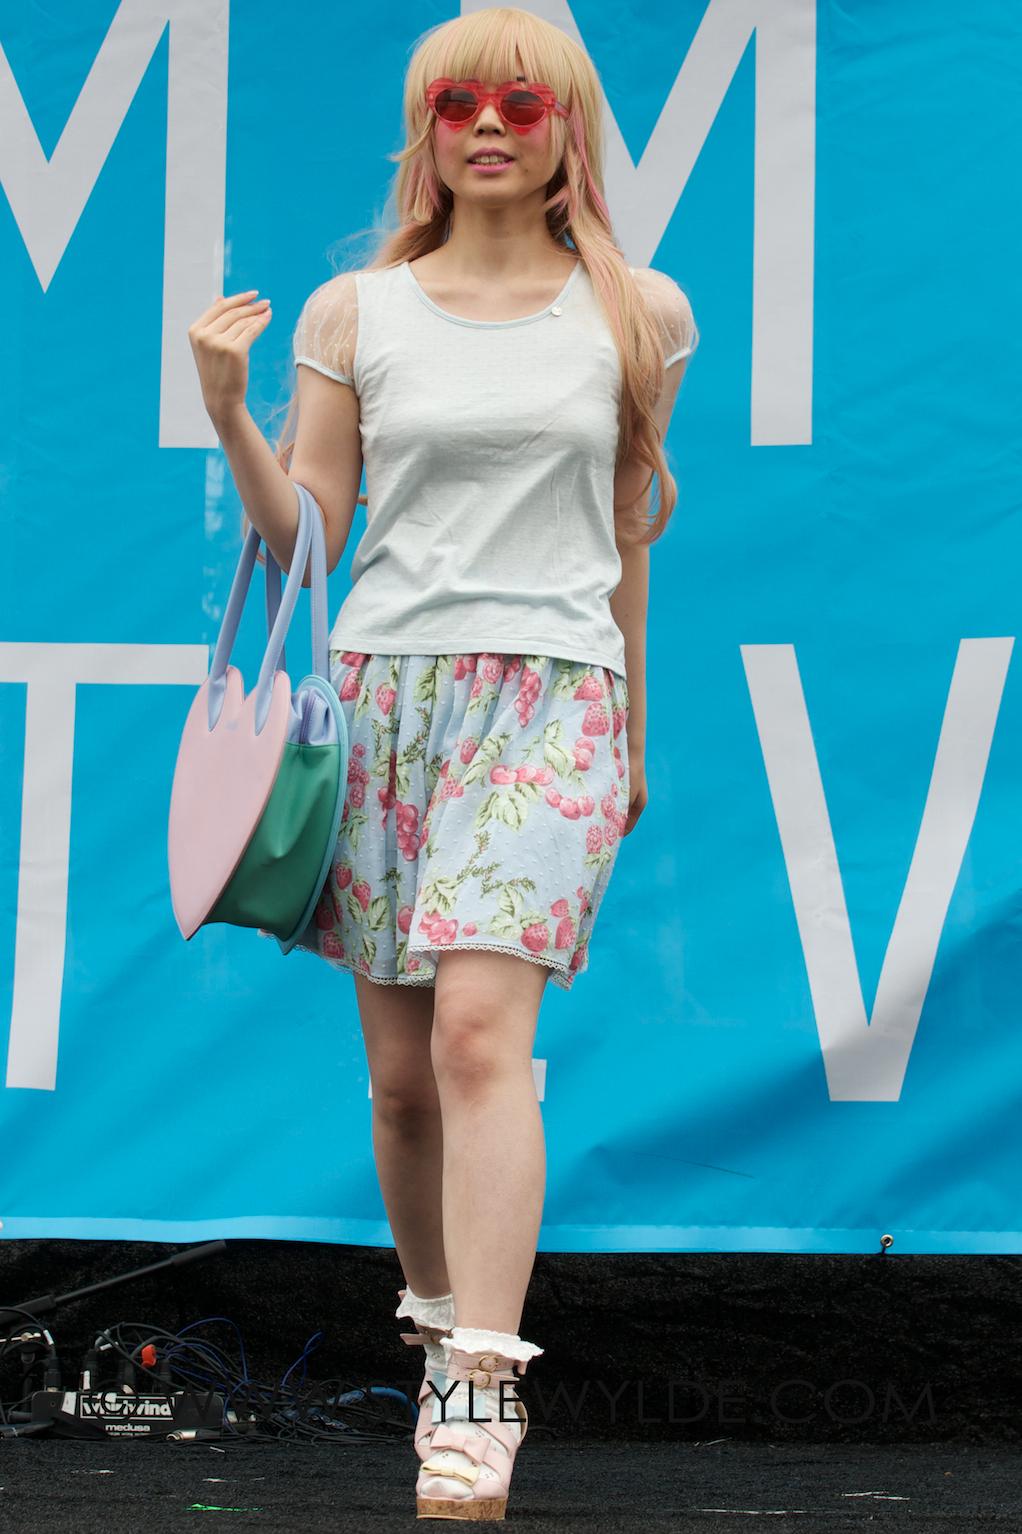 stylewylde_jpop_2013_fashion_show_9.jpg